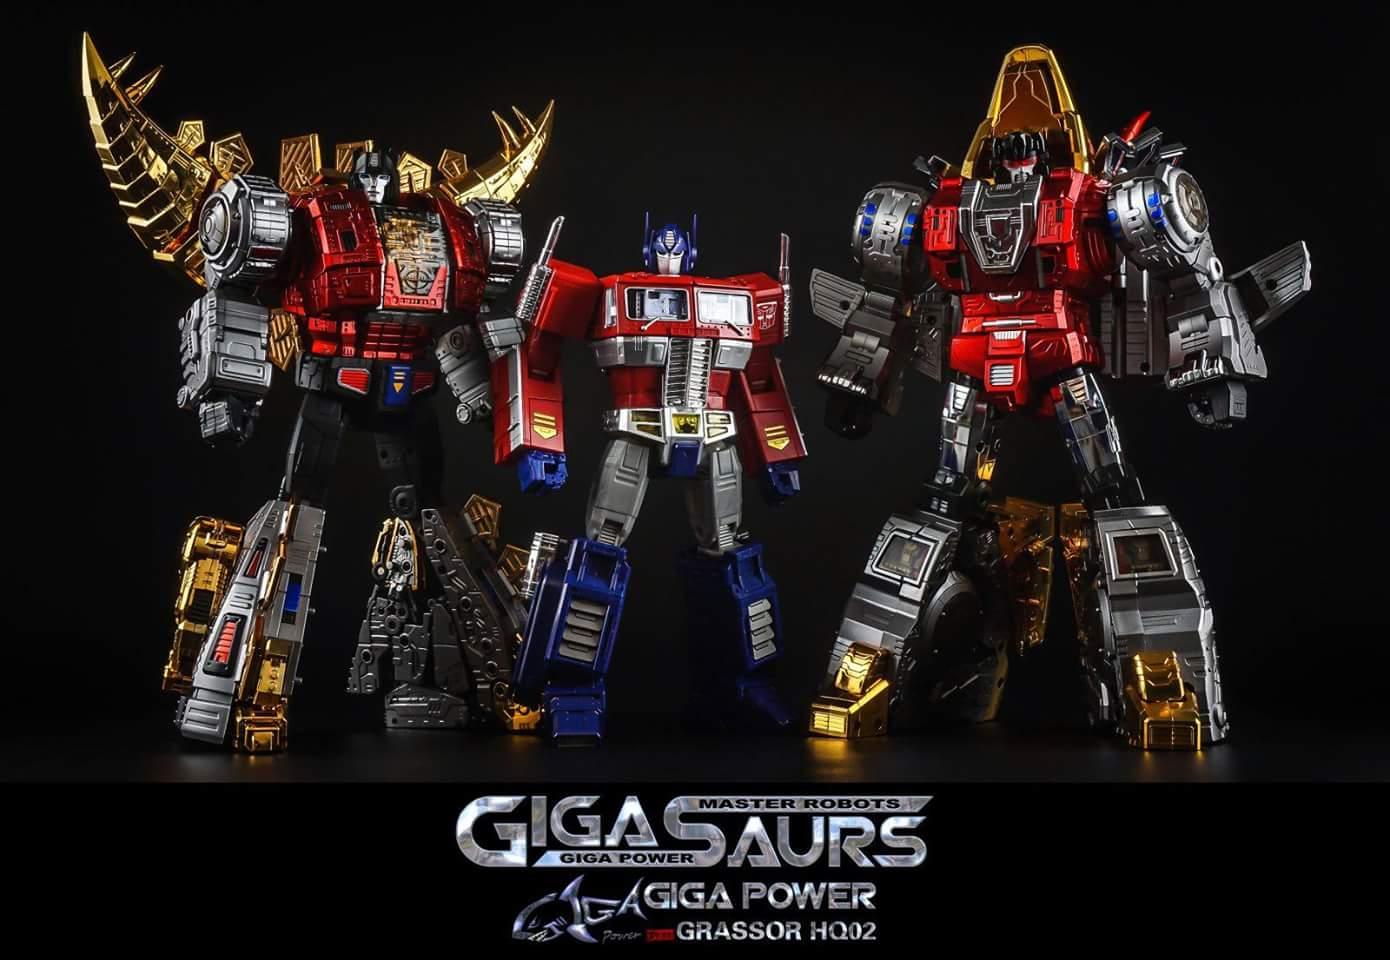 [GigaPower] Produit Tiers - Jouets HQ-01 Superator + HQ-02 Grassor + HQ-03 Guttur + HQ-04 Graviter + HQ-05 Gaudenter - aka Dinobots - Page 4 WYsXbP6i